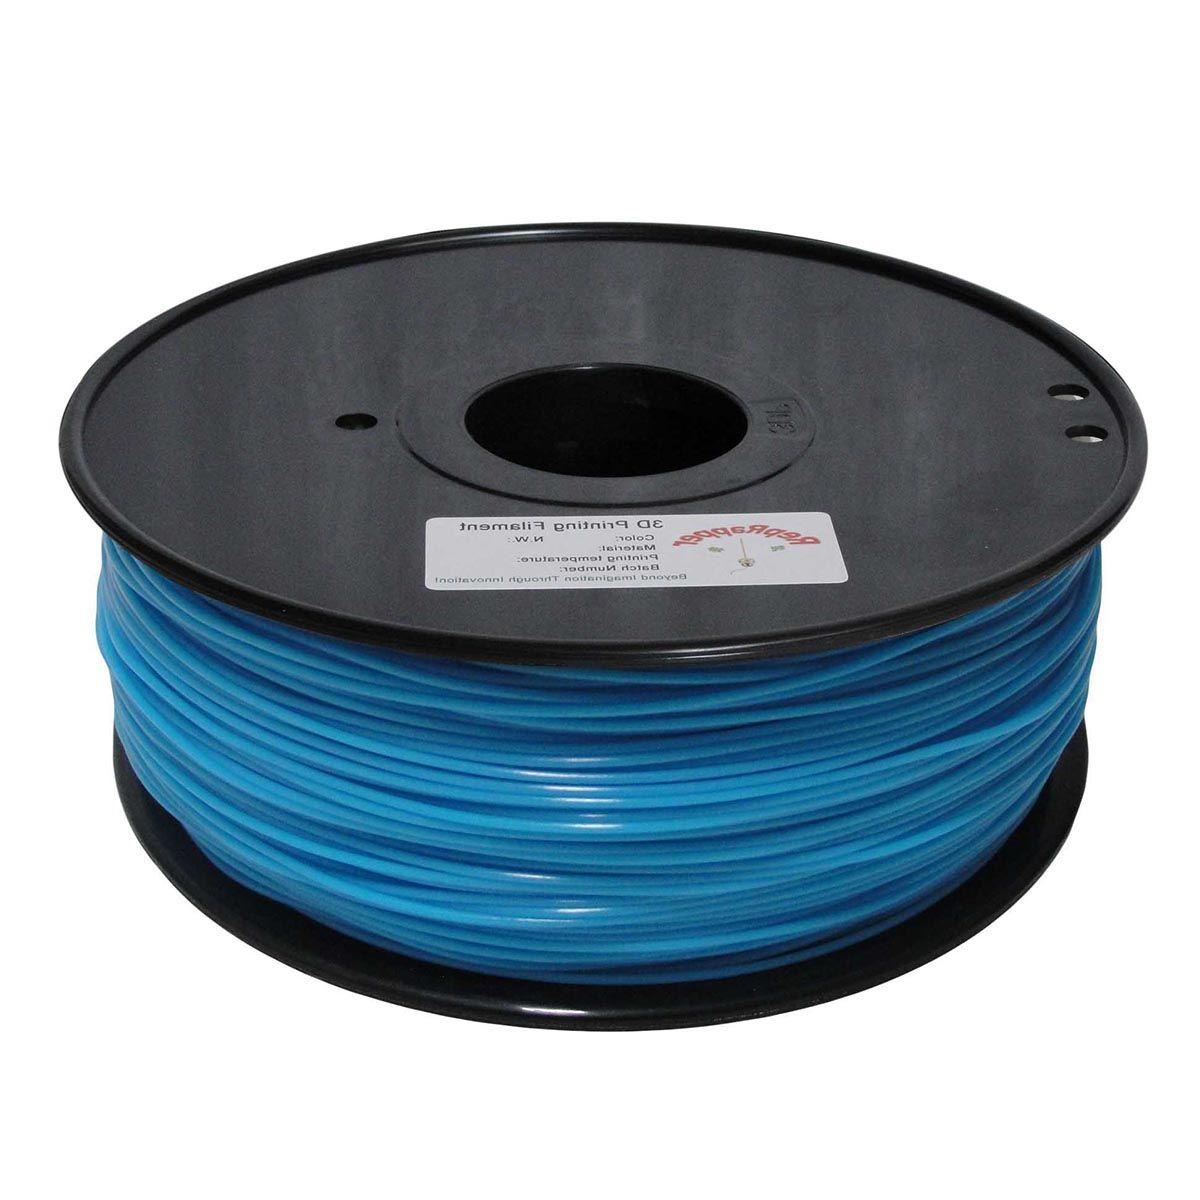 Online Cheap Luminous Series 3d Print Wire Of Printer Supplies For ...